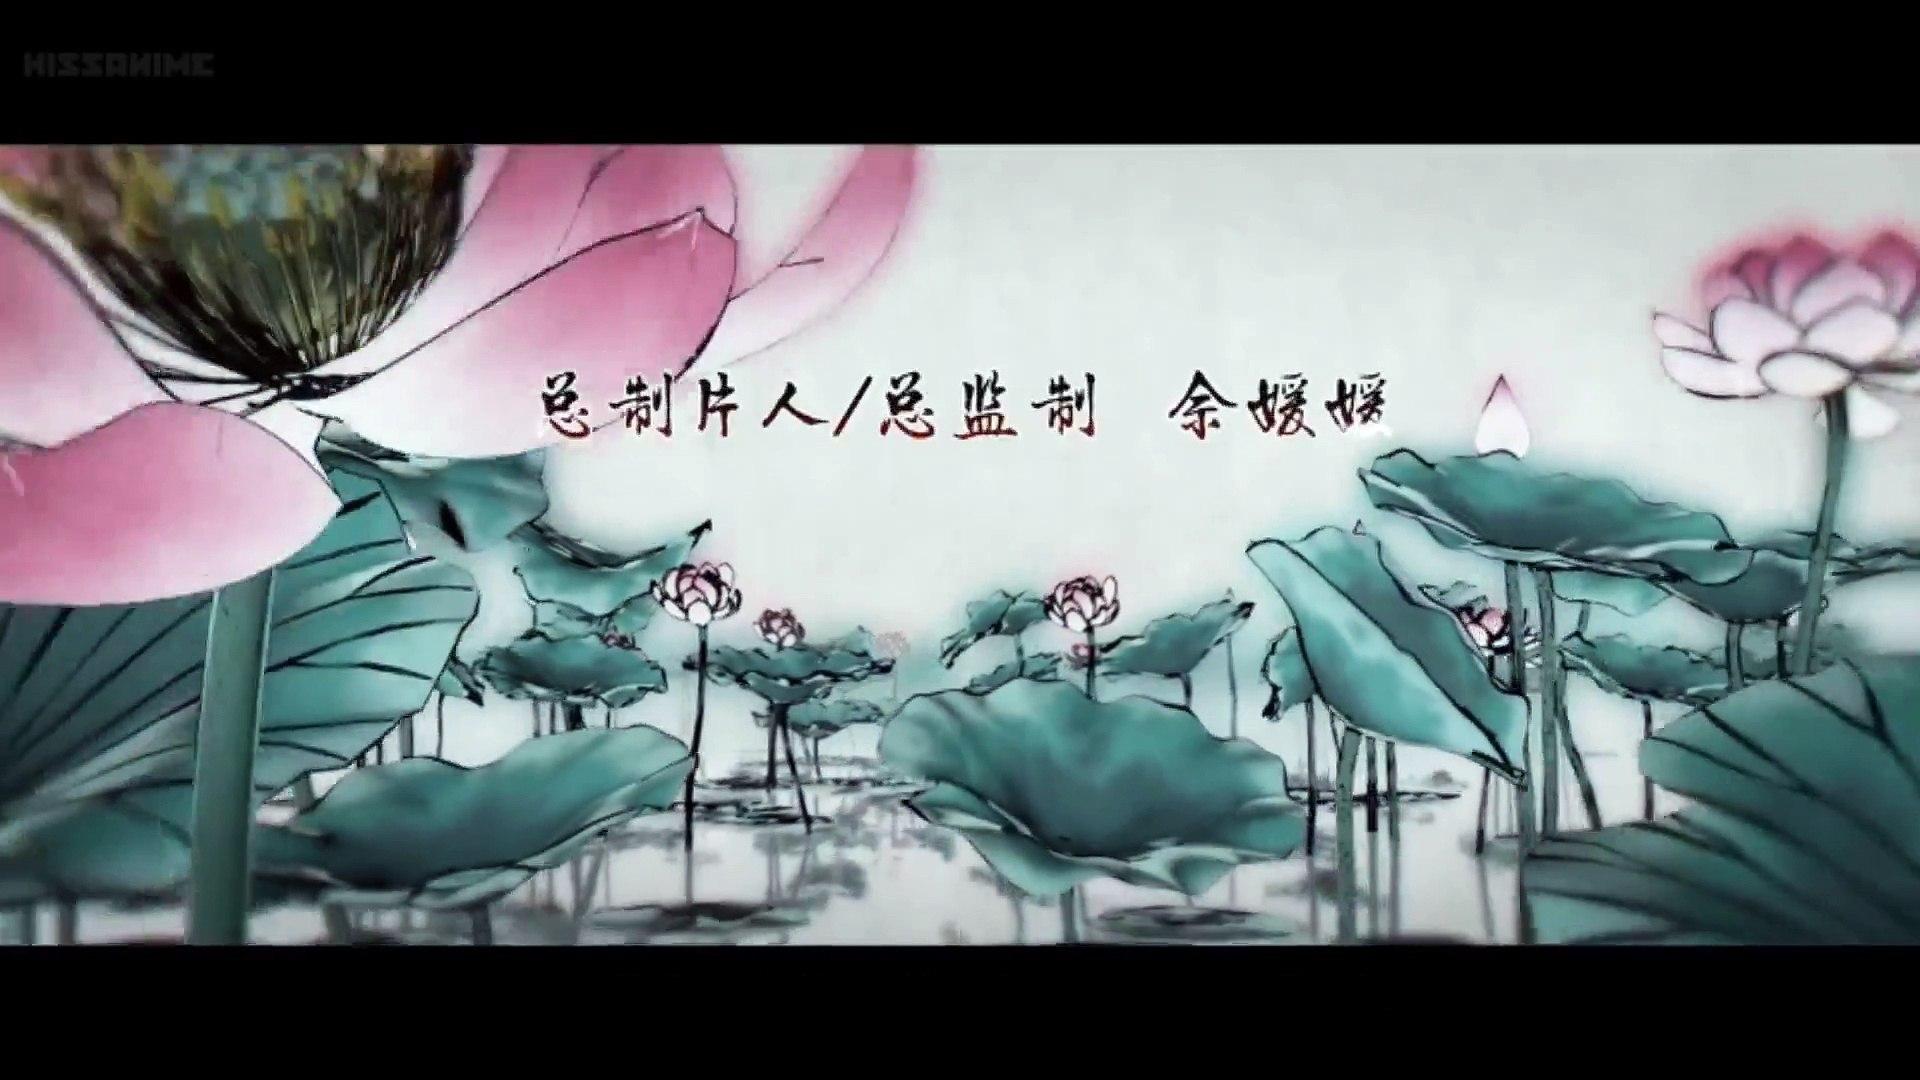 Mo Dao Zu Shi [魔道祖师)] (Grandmaster of Demonic Cultivation) Opening -  Drunken Dream of the Past